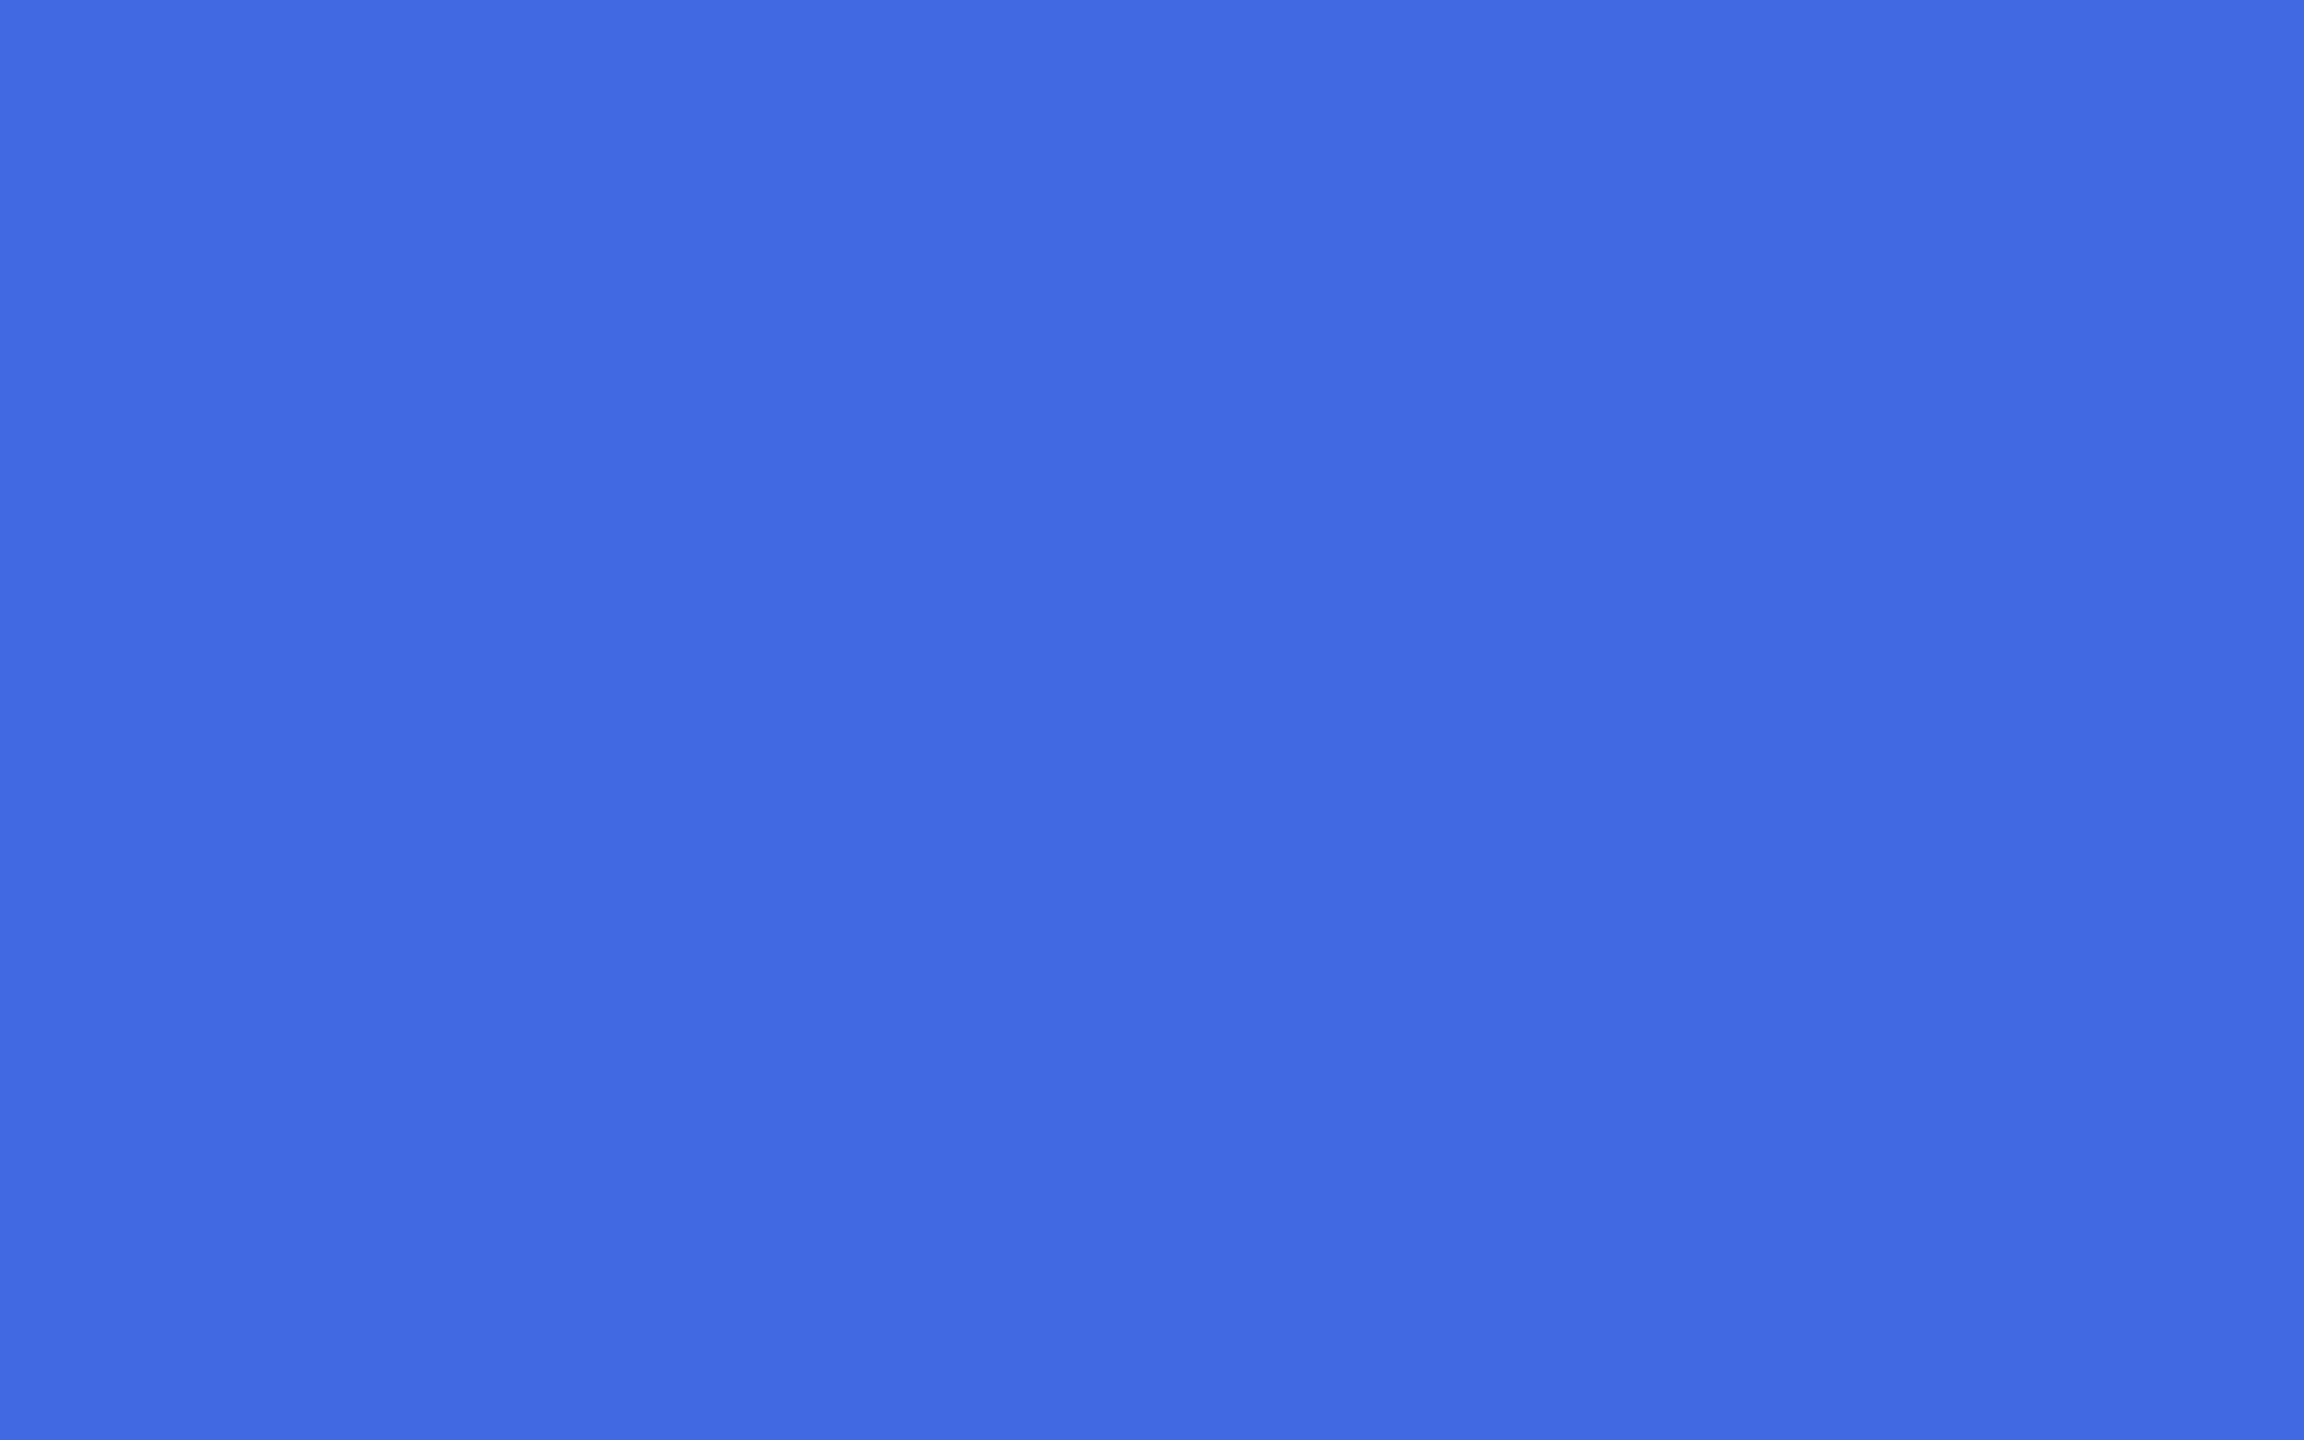 2304x1440 Royal Blue Web Solid Color Background